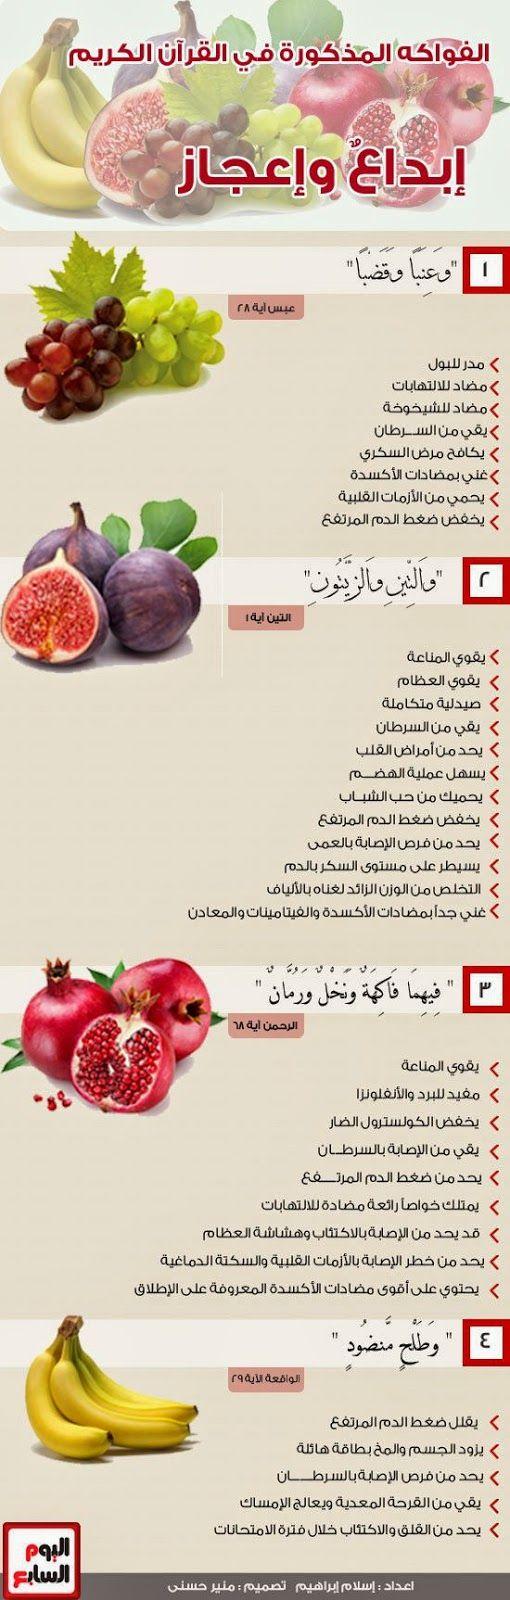 Mahalet Damana إنفوجرافيك الفواكه المذكورة في القرآن الكريم Health Fitness Nutrition Health Facts Food Health Healthy